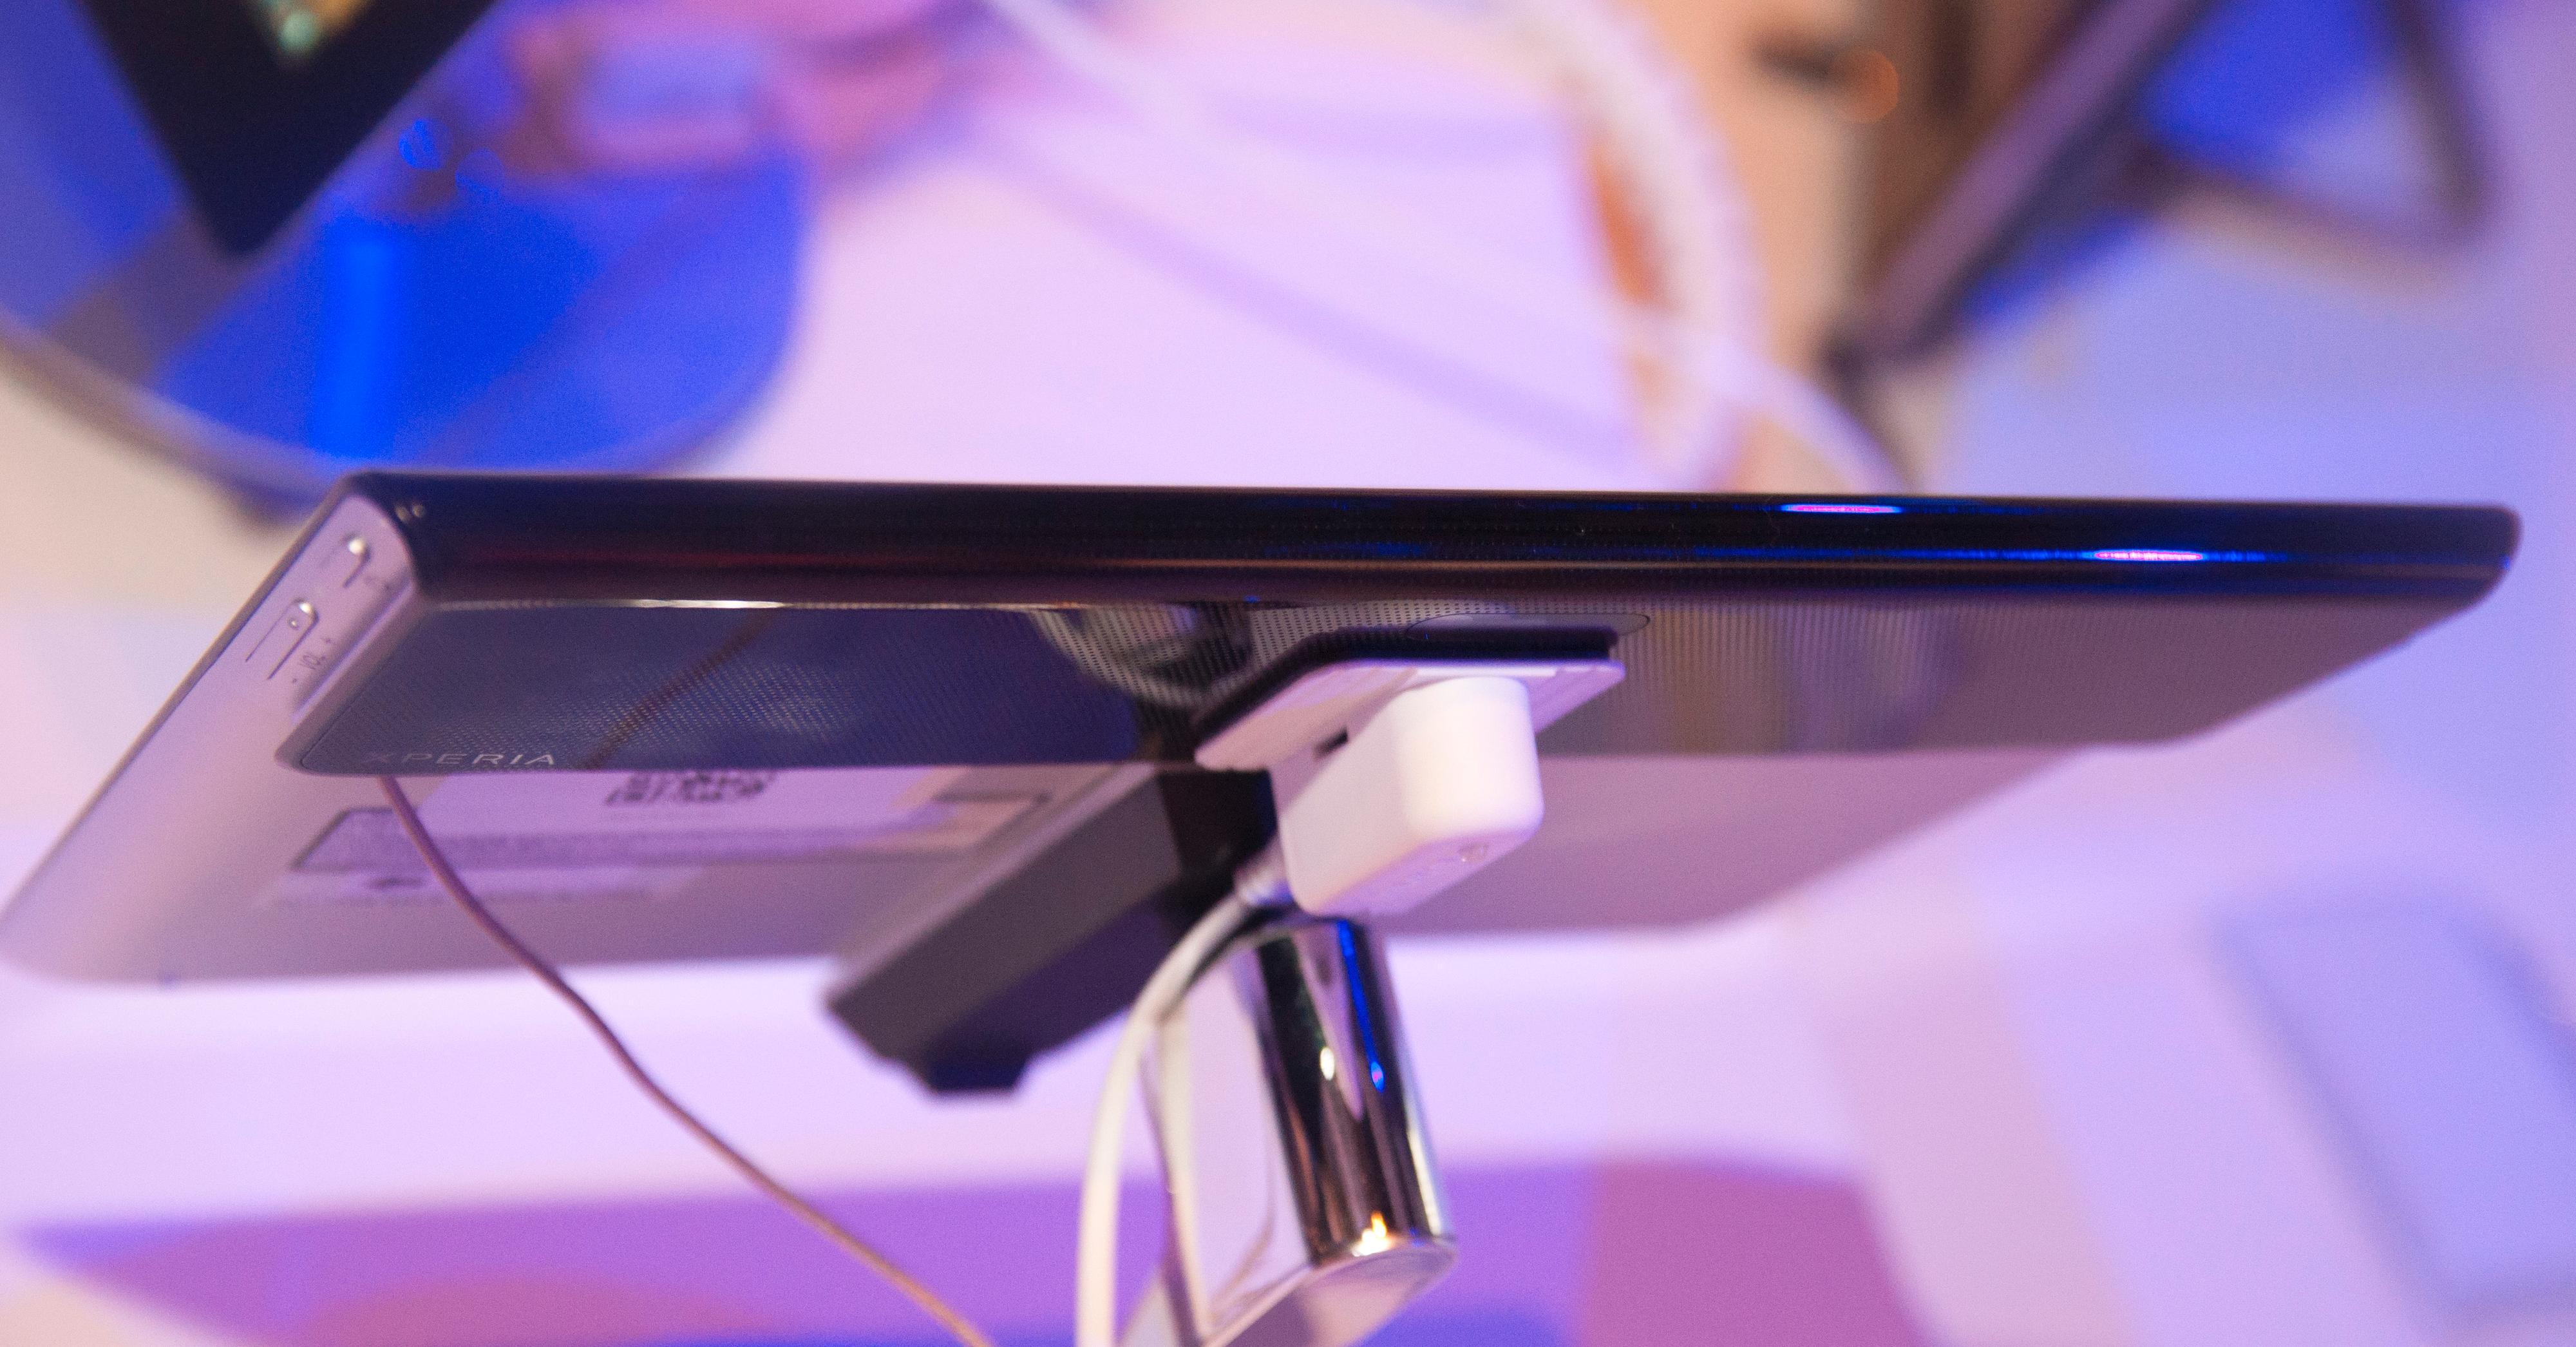 Slik ser Xperia Tablet S ut fra baksiden.Foto: Finn Jarle Kvalheim, Amobil.no